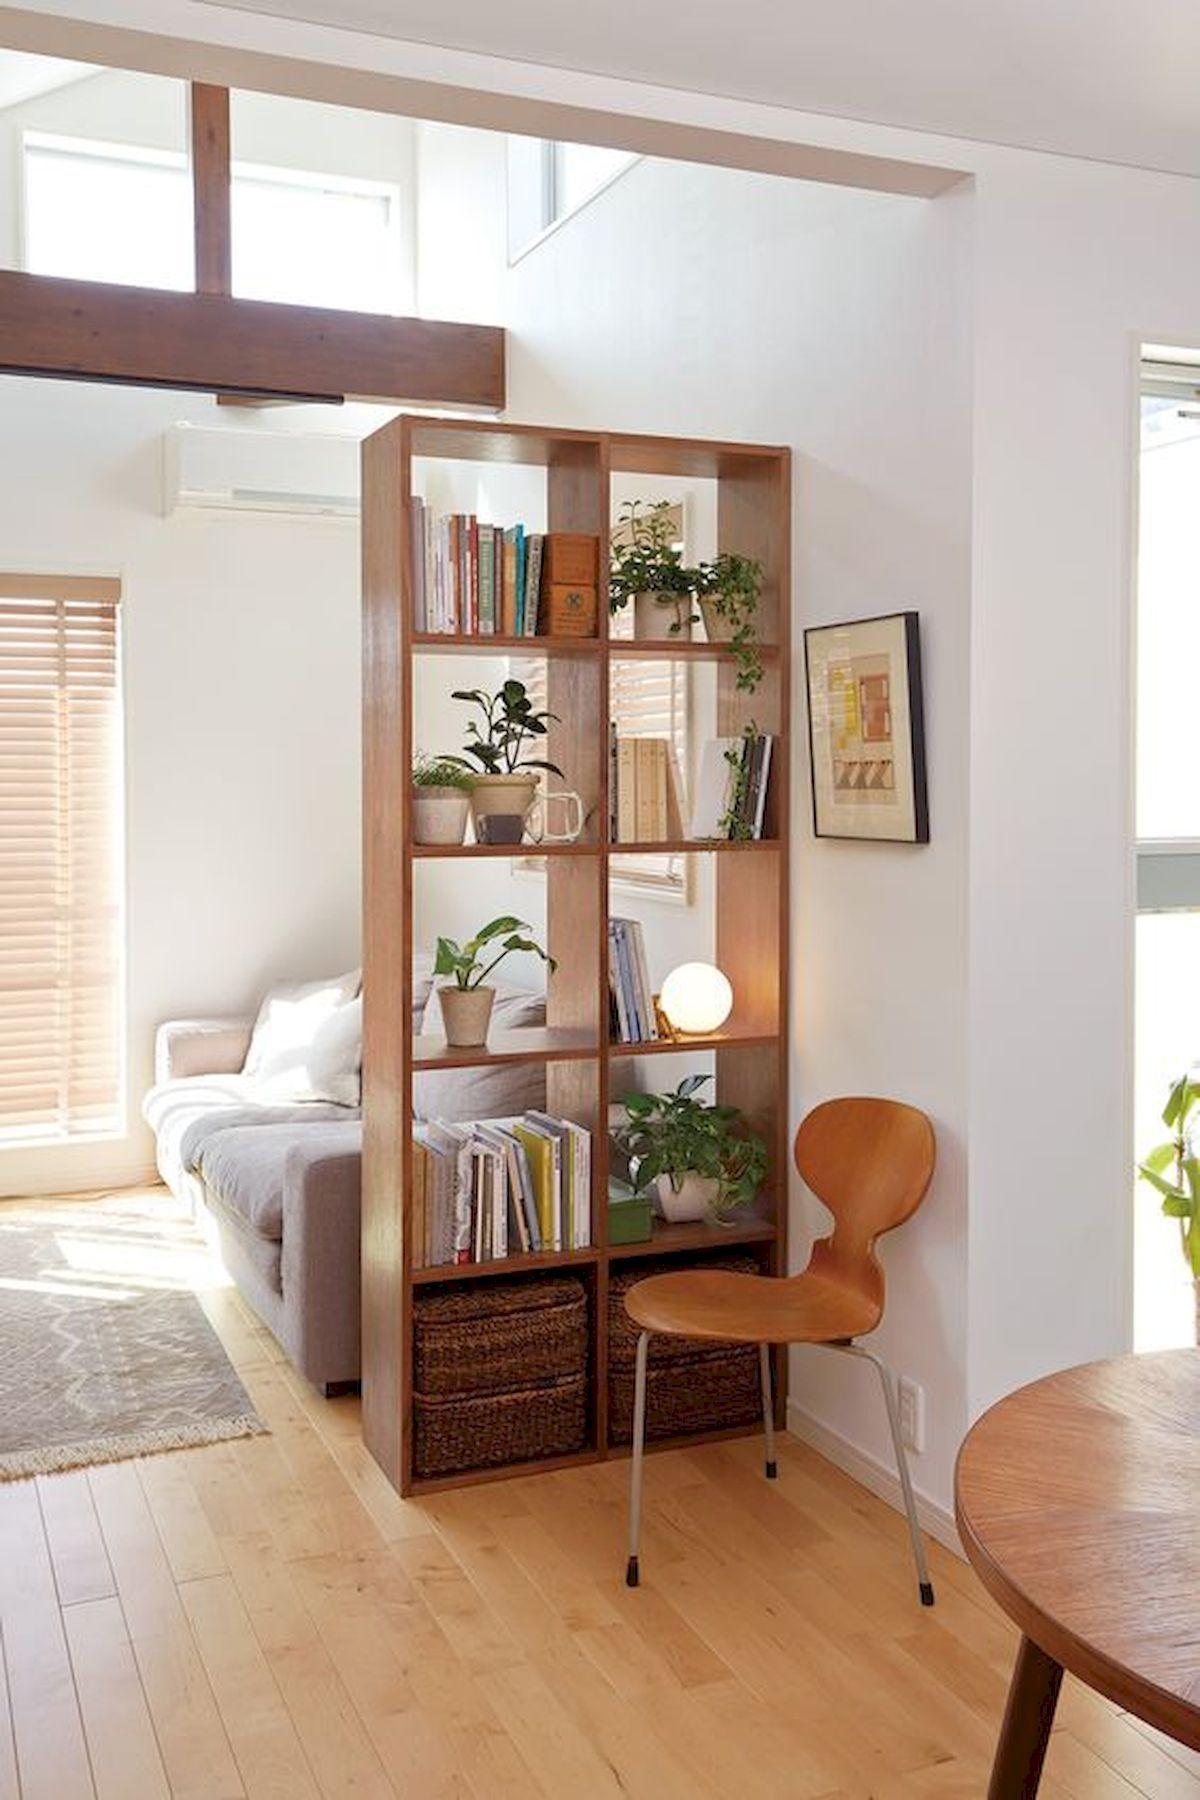 Photo of 32 DIY Apartment Decor Ideas on A Budget